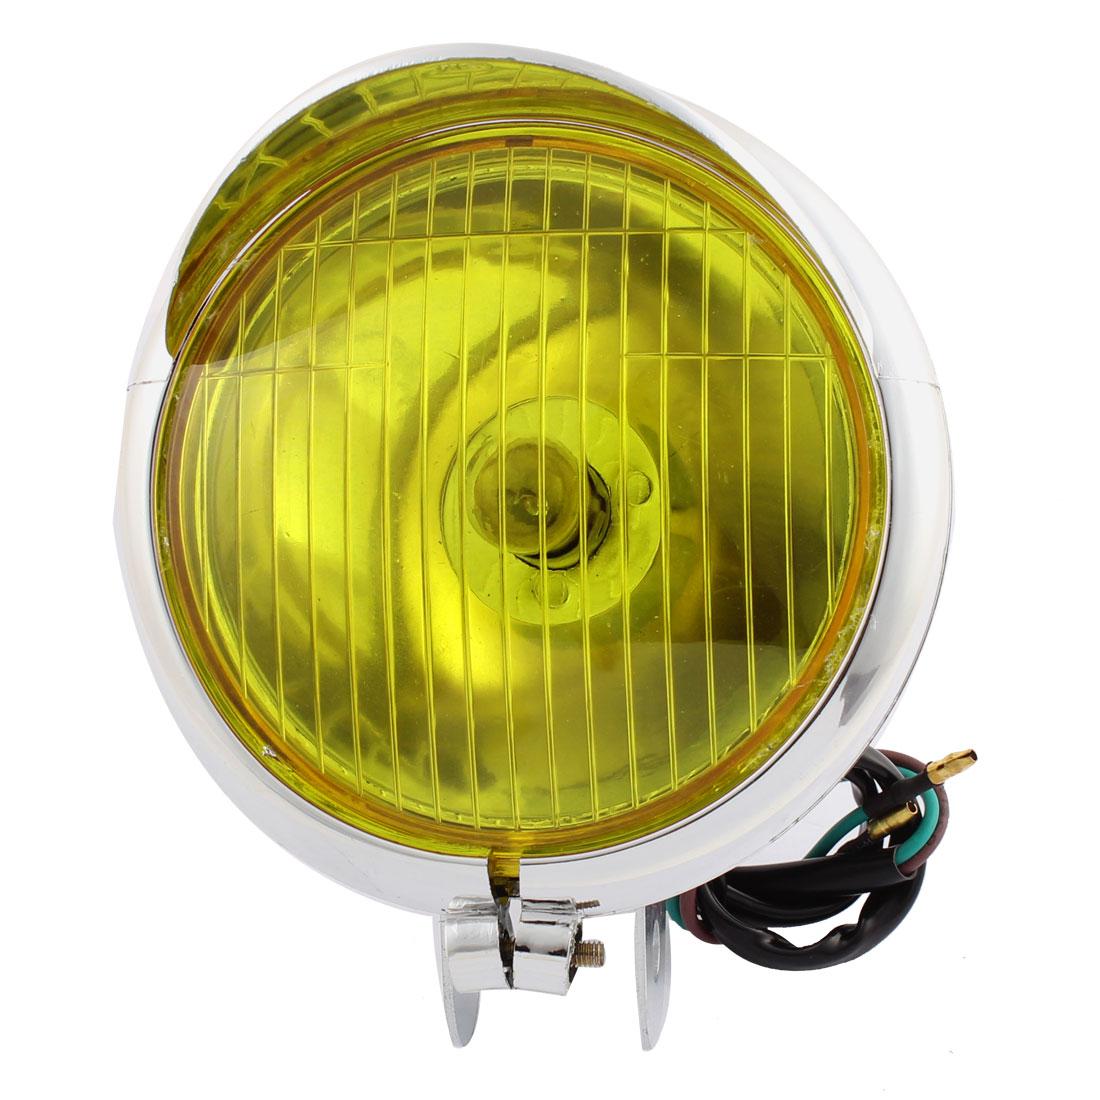 Chrome Plastic Motorcycle Headlight Yellow Headlamp Light Bulb Bucket for GN